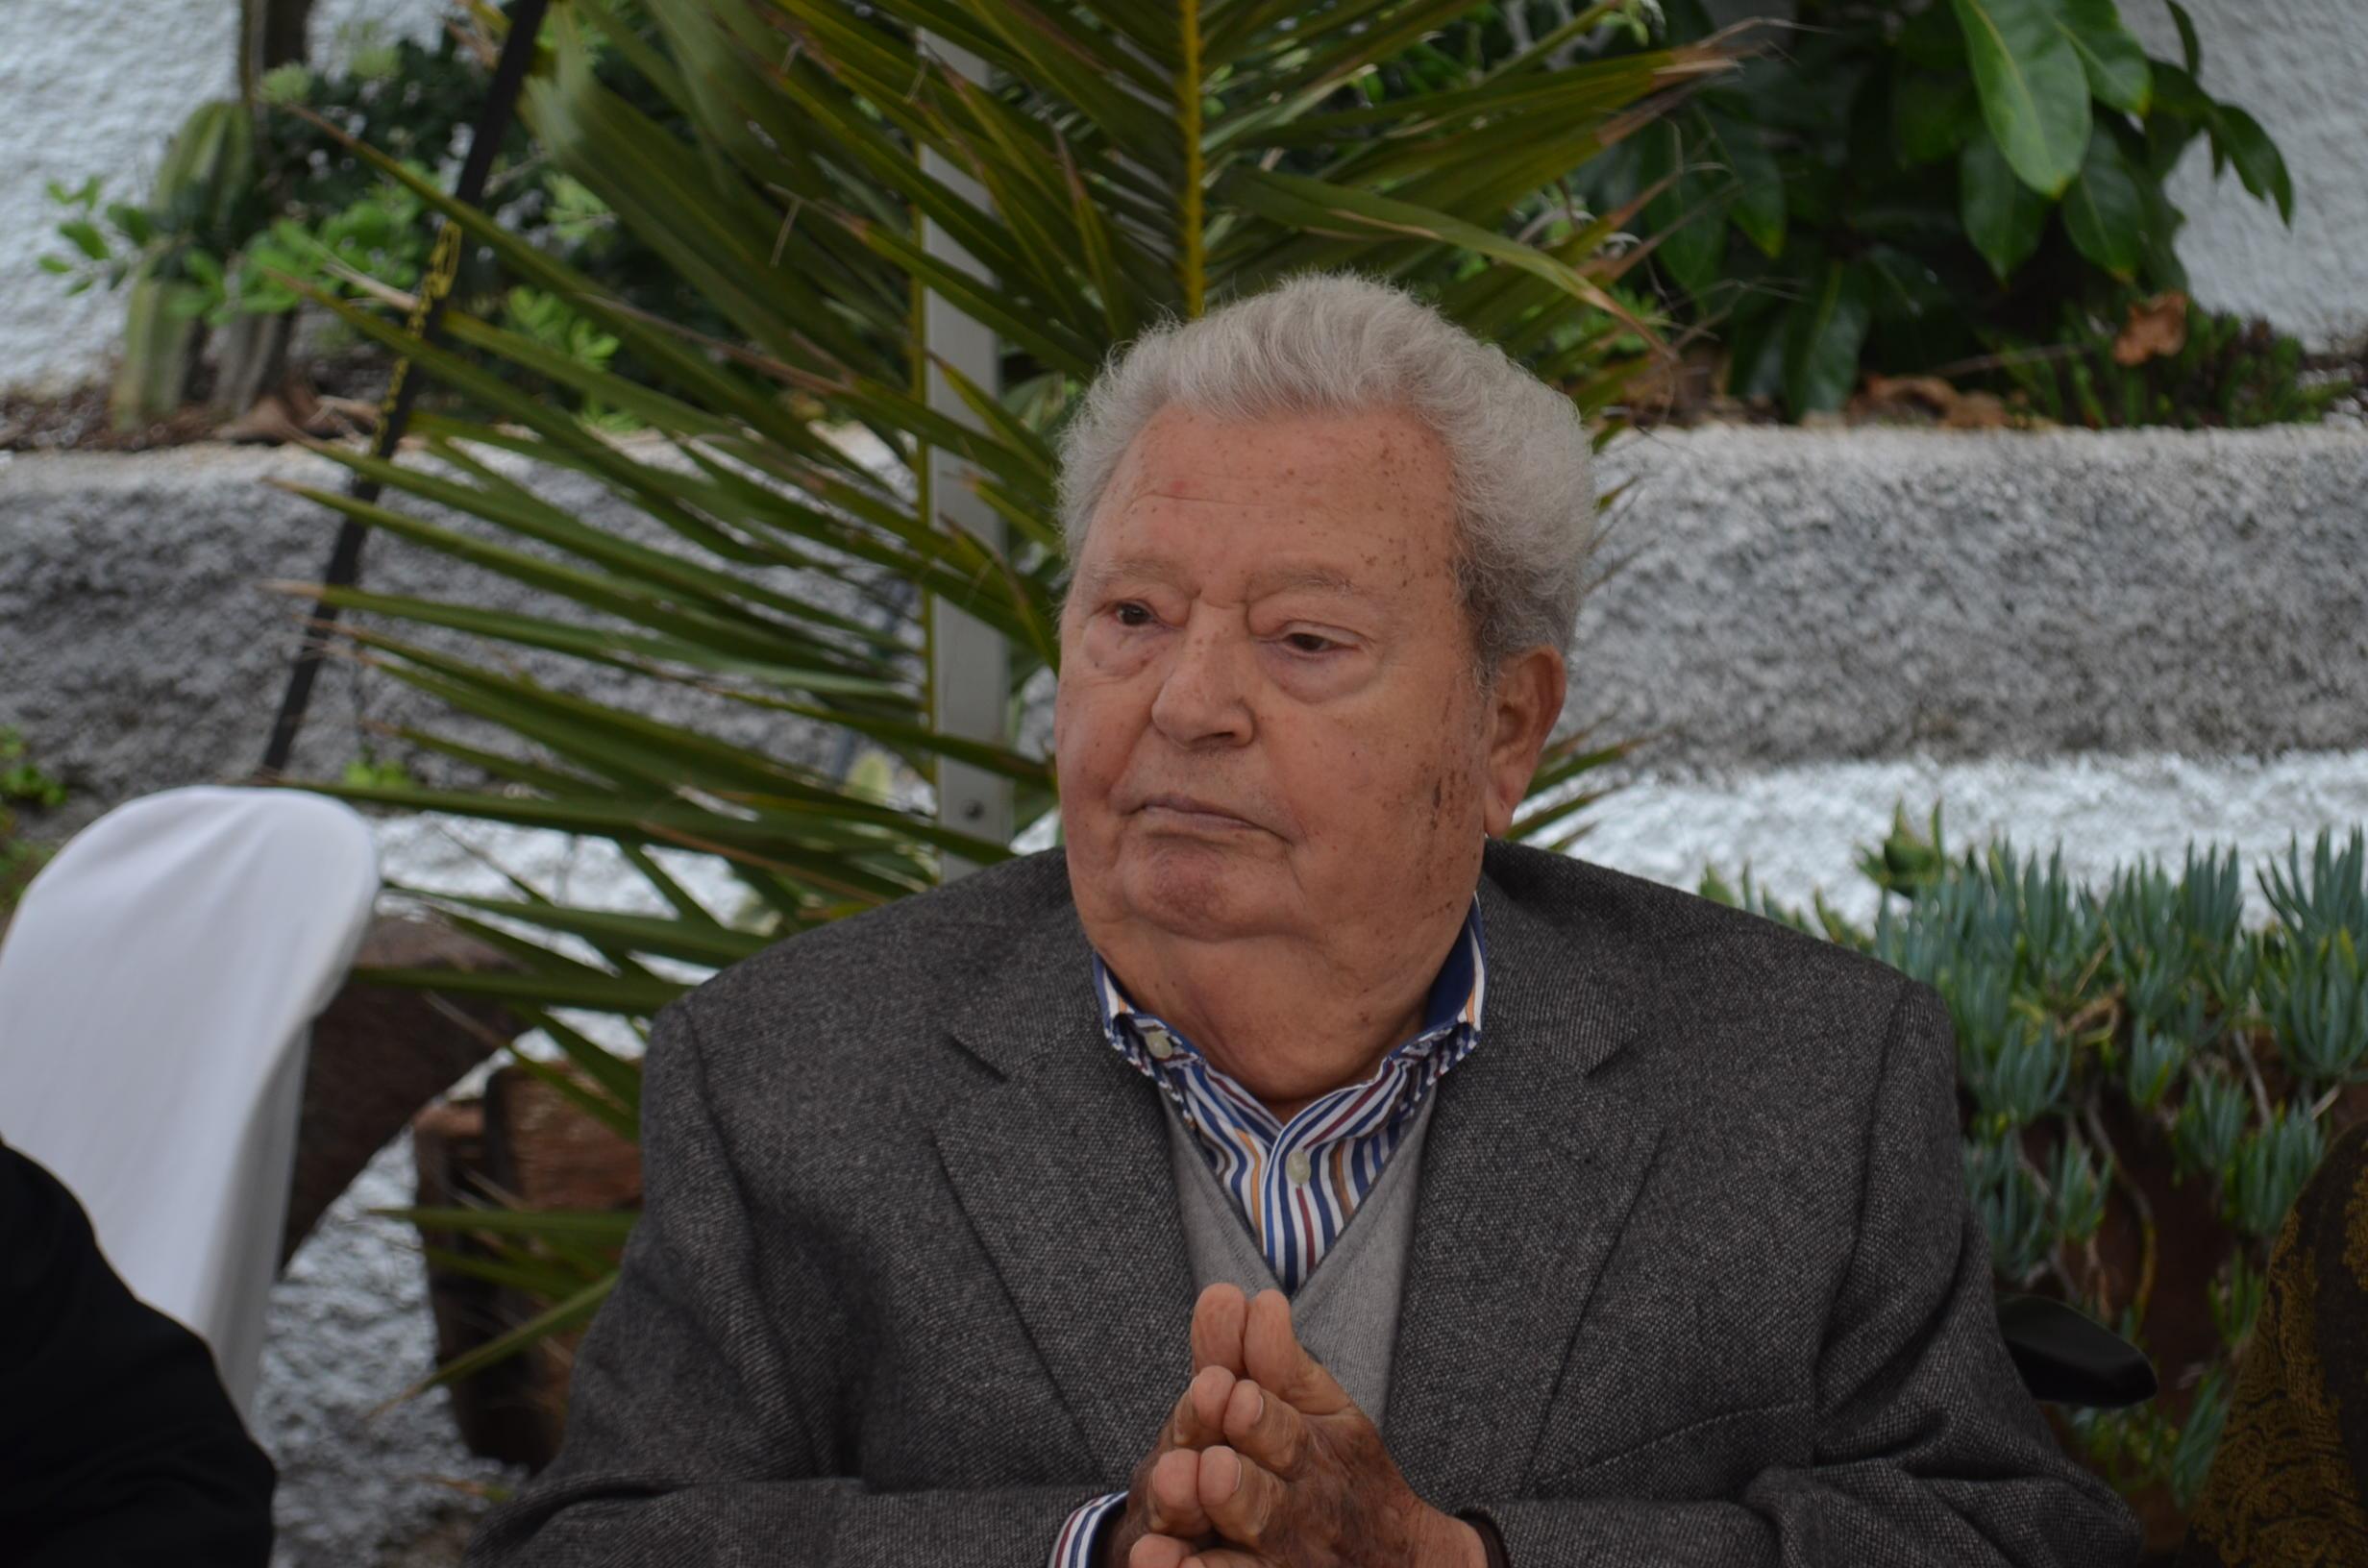 Alberto Juan Herrera Hernández agradeció el homenaje